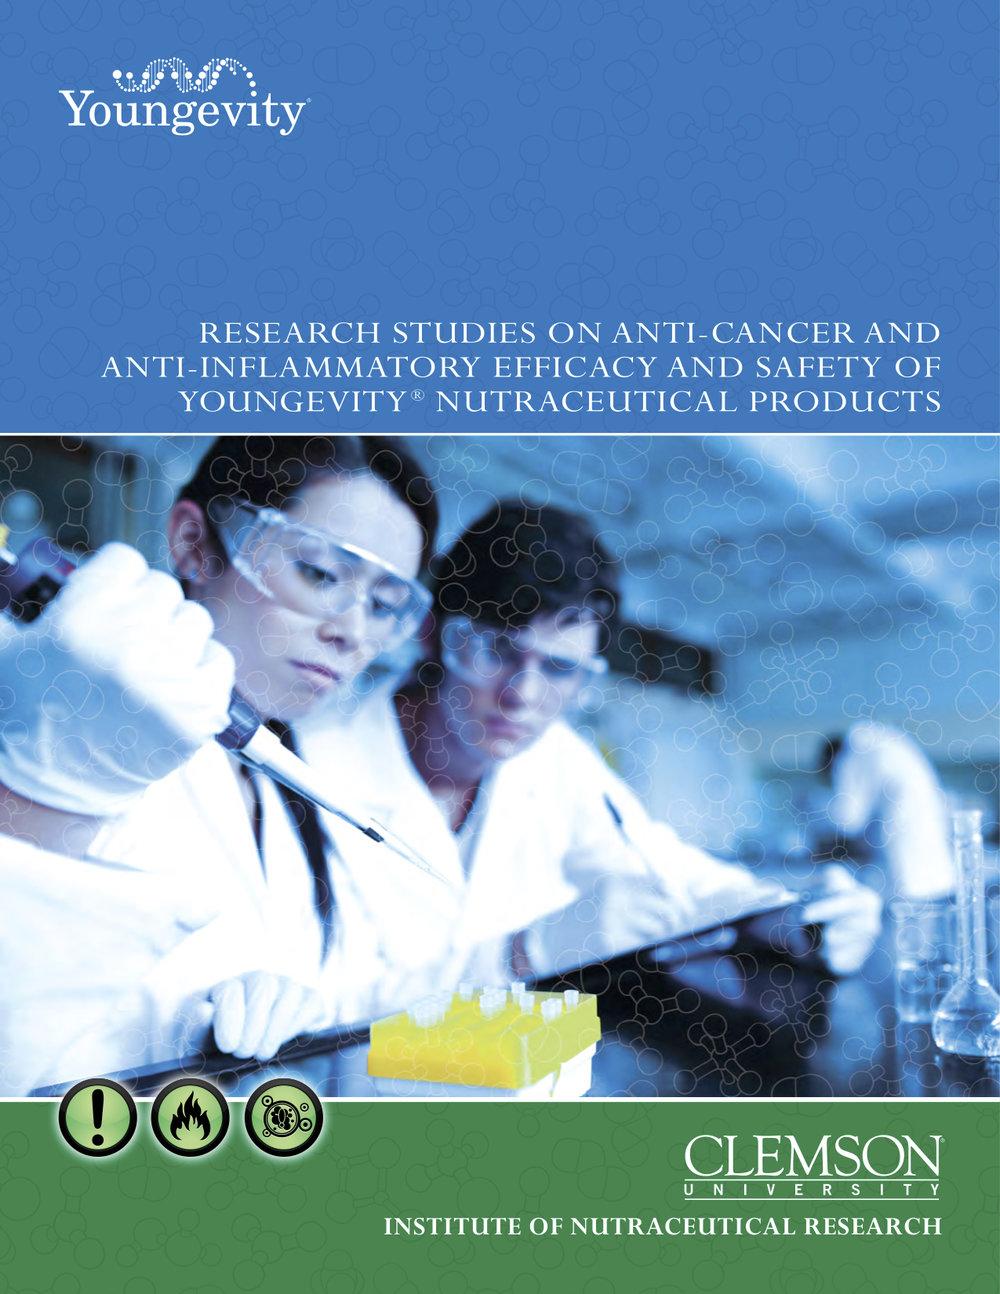 Clemson-Report_brochure-0113-6pgs.jpg